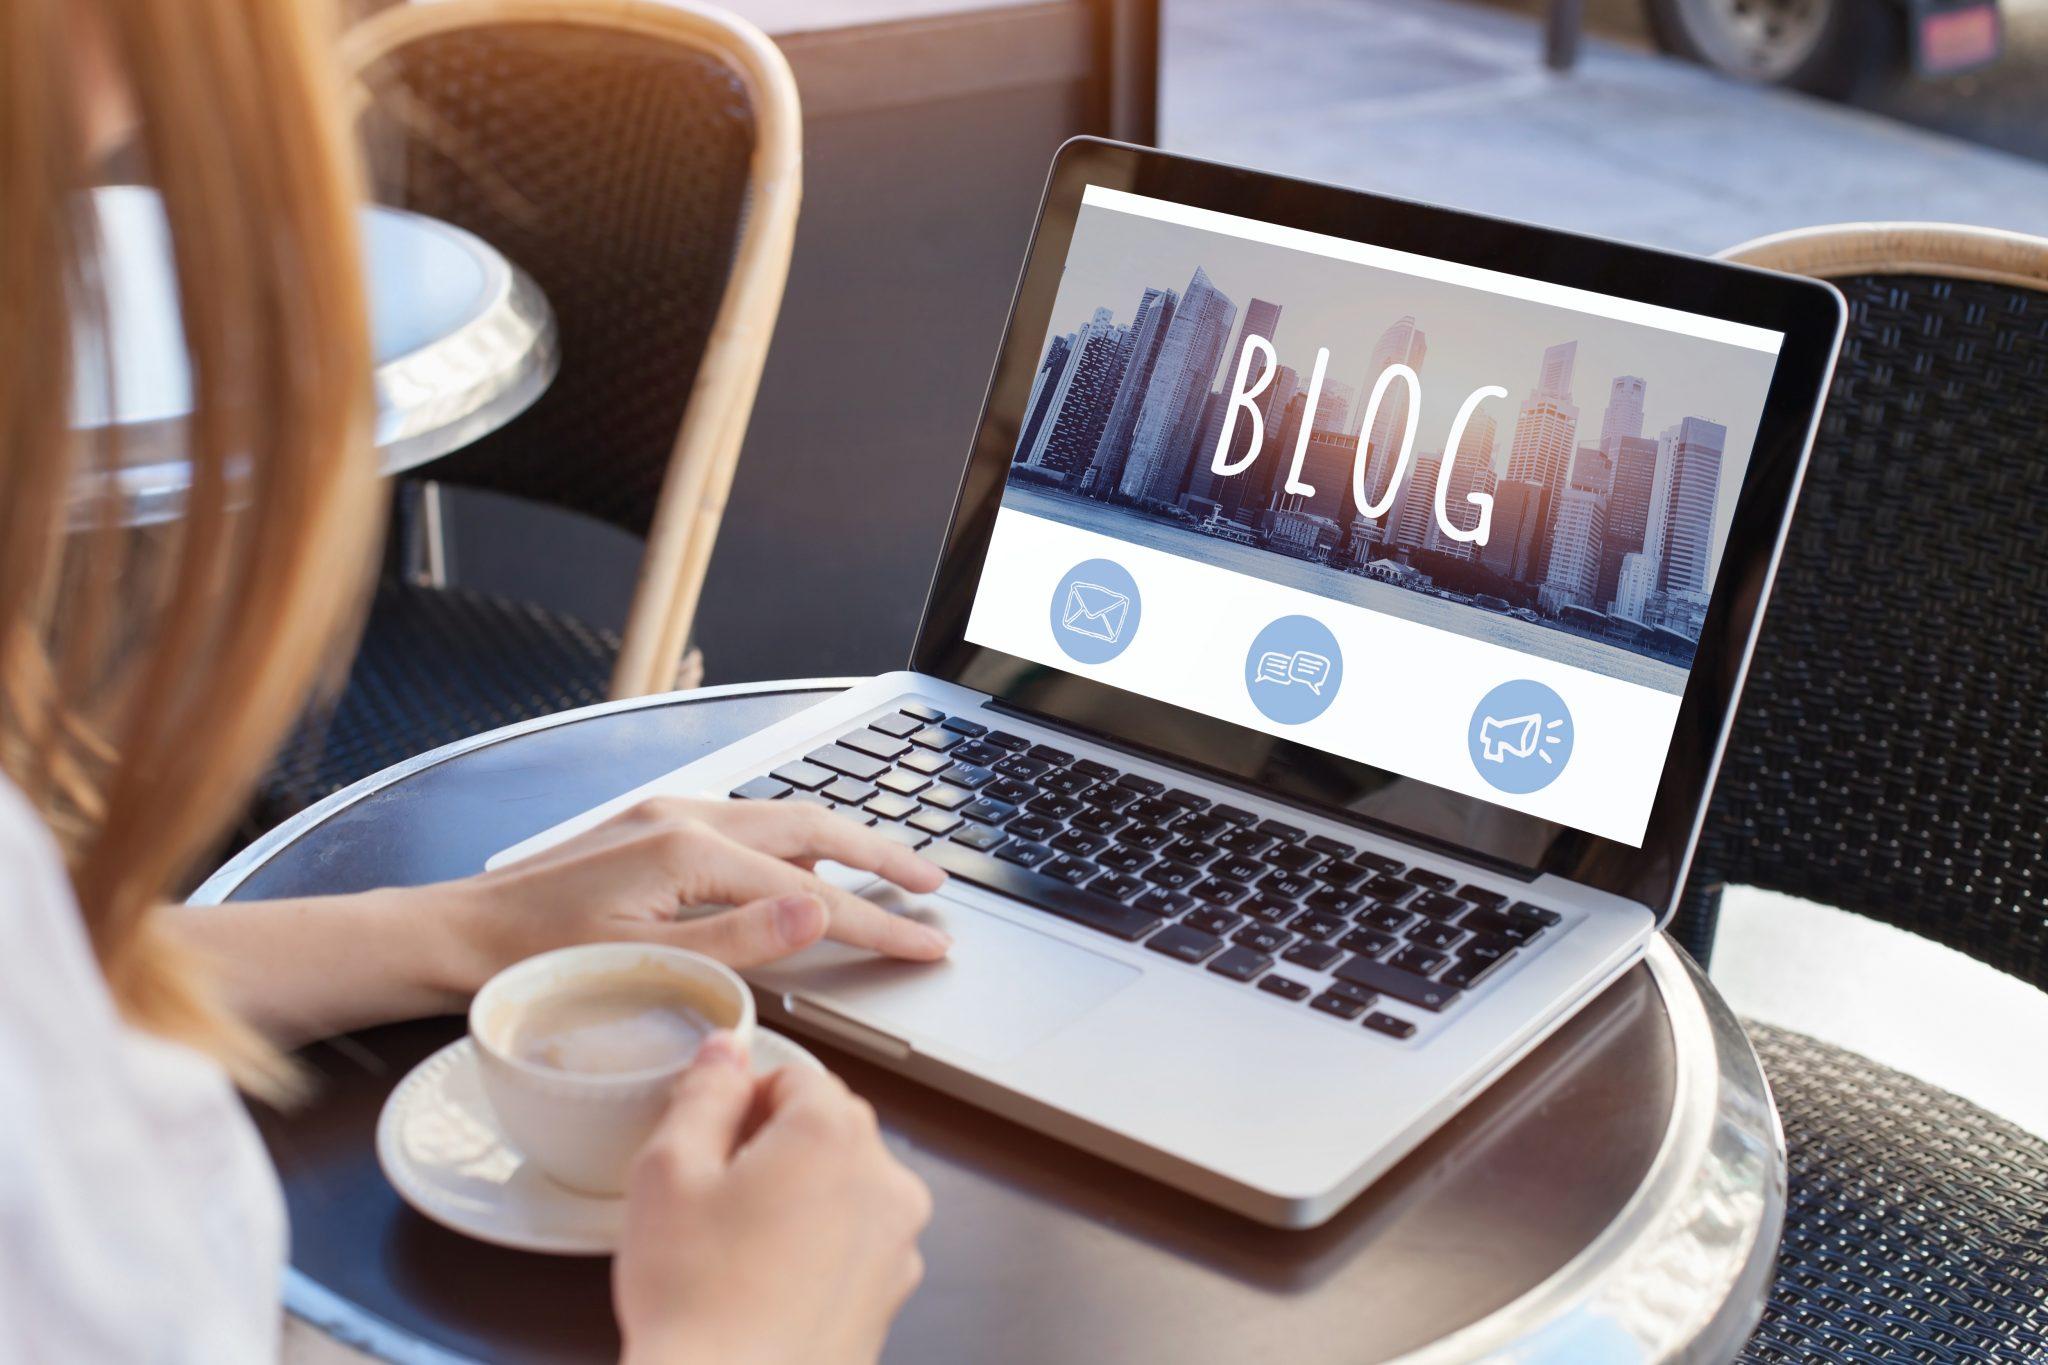 seo blog post online